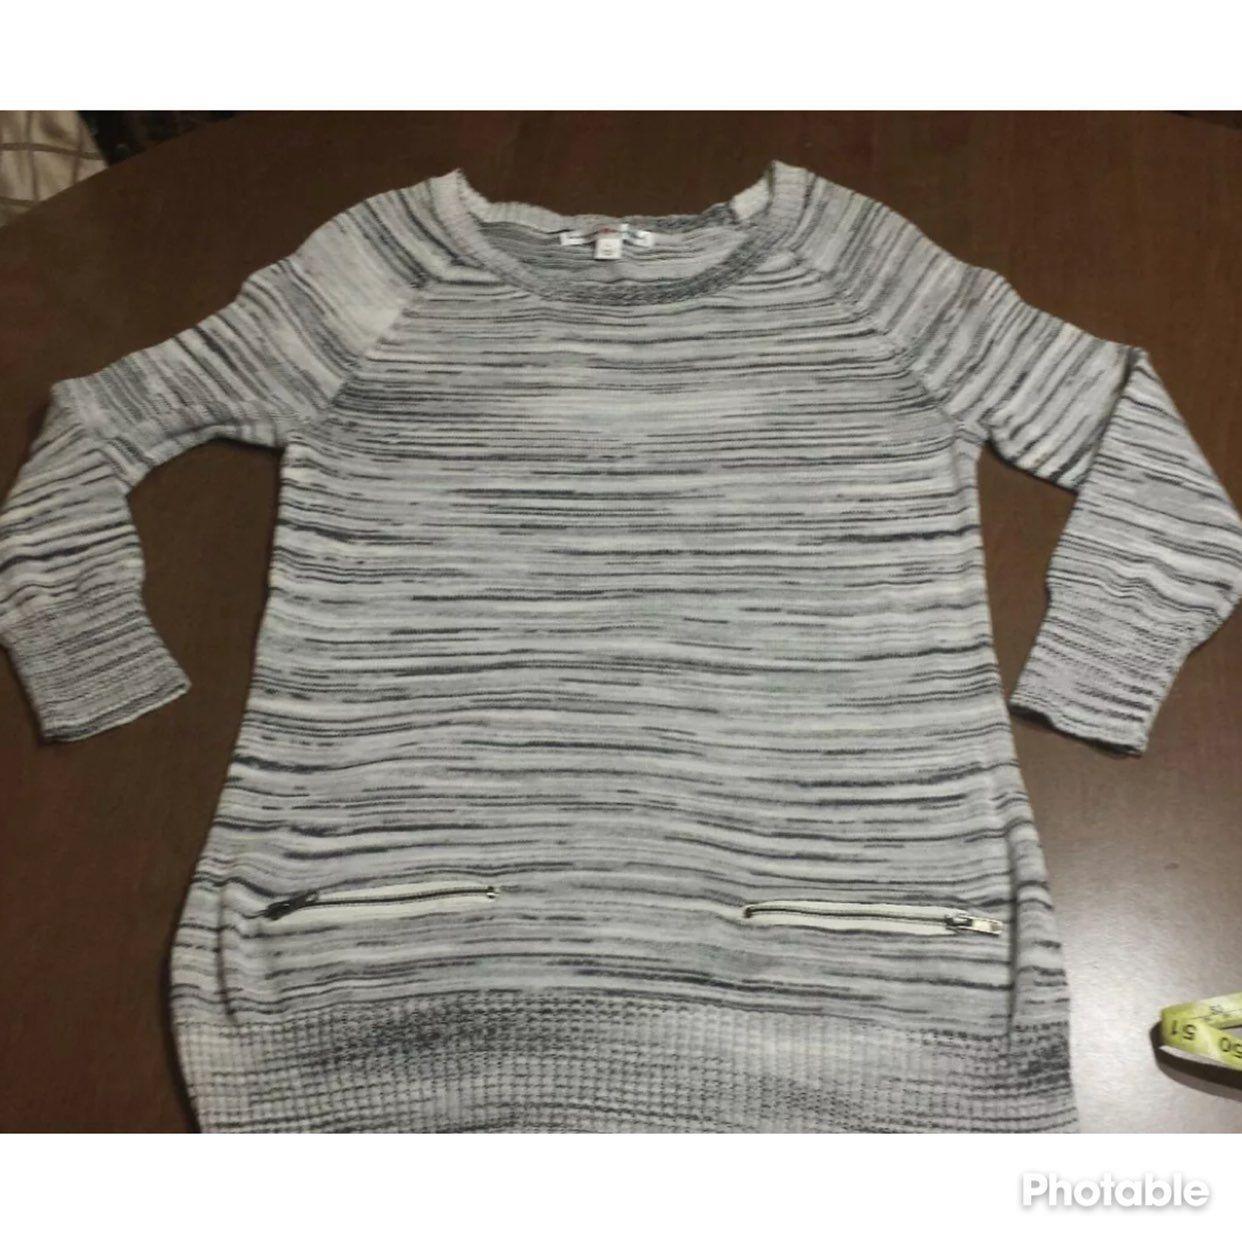 Gray Cotton Tunic Sweater Zipper Pockets - Mercari: BUY & SELL ...